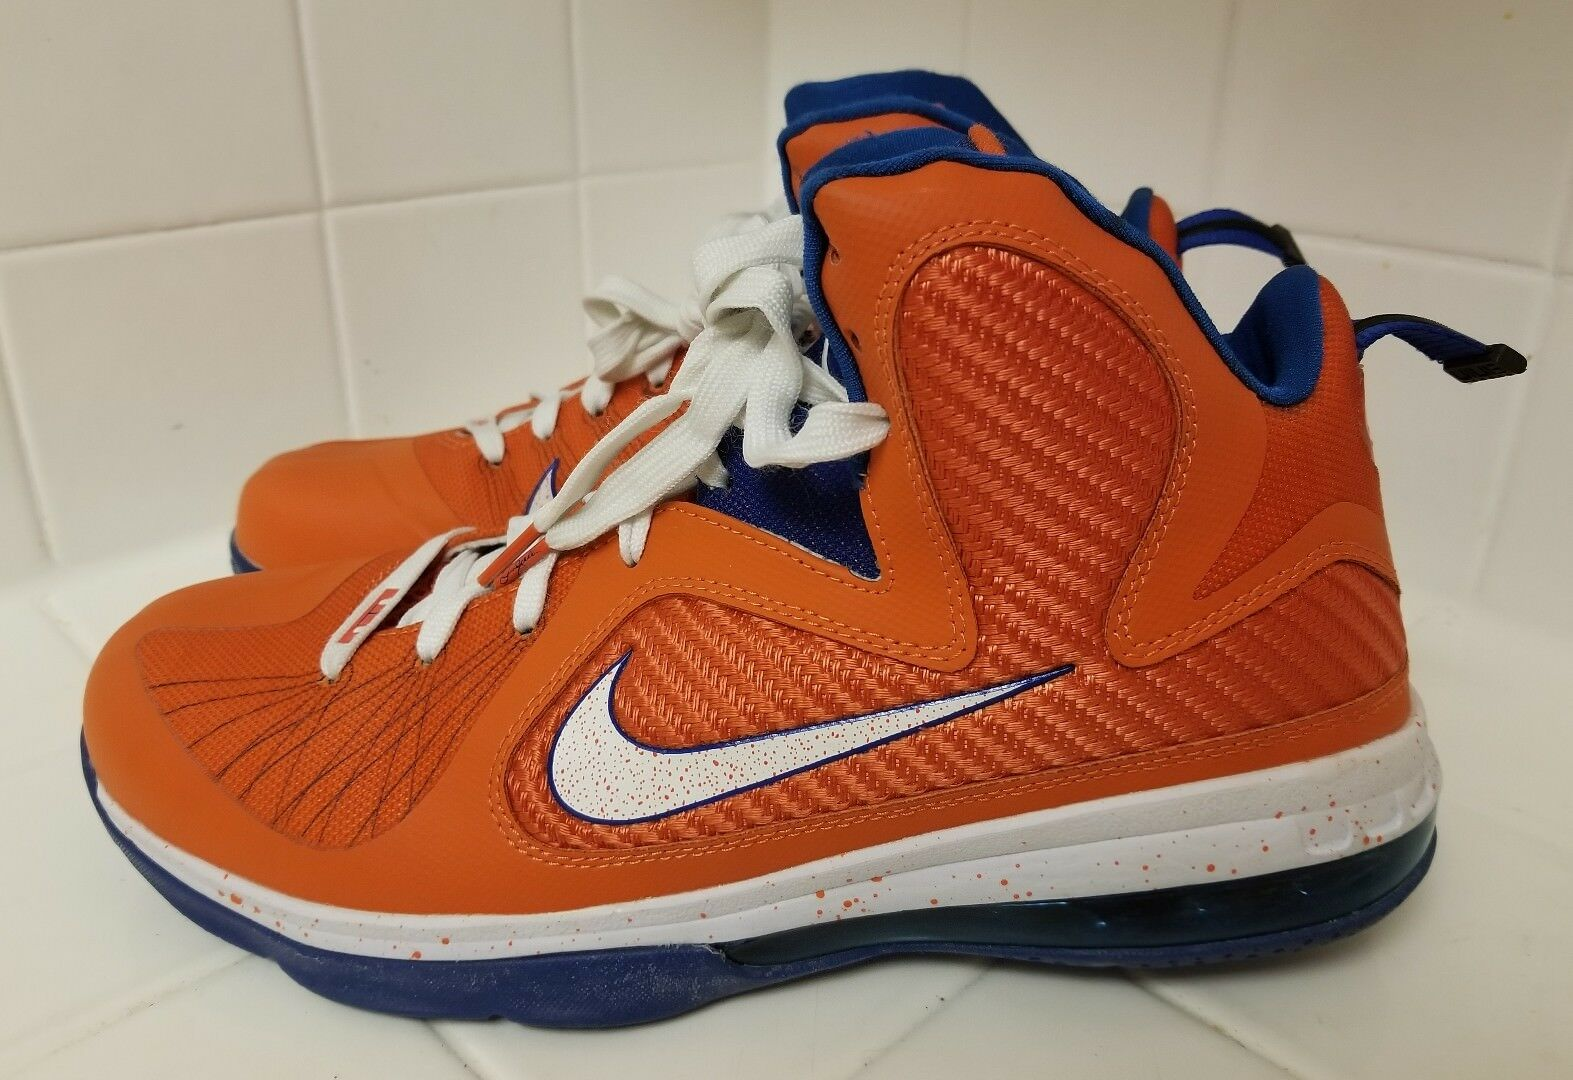 Rara Uomo nike lebron 9 9 lebron swingman scarpa arancione / bianco / blu basket numero 10 4f1663